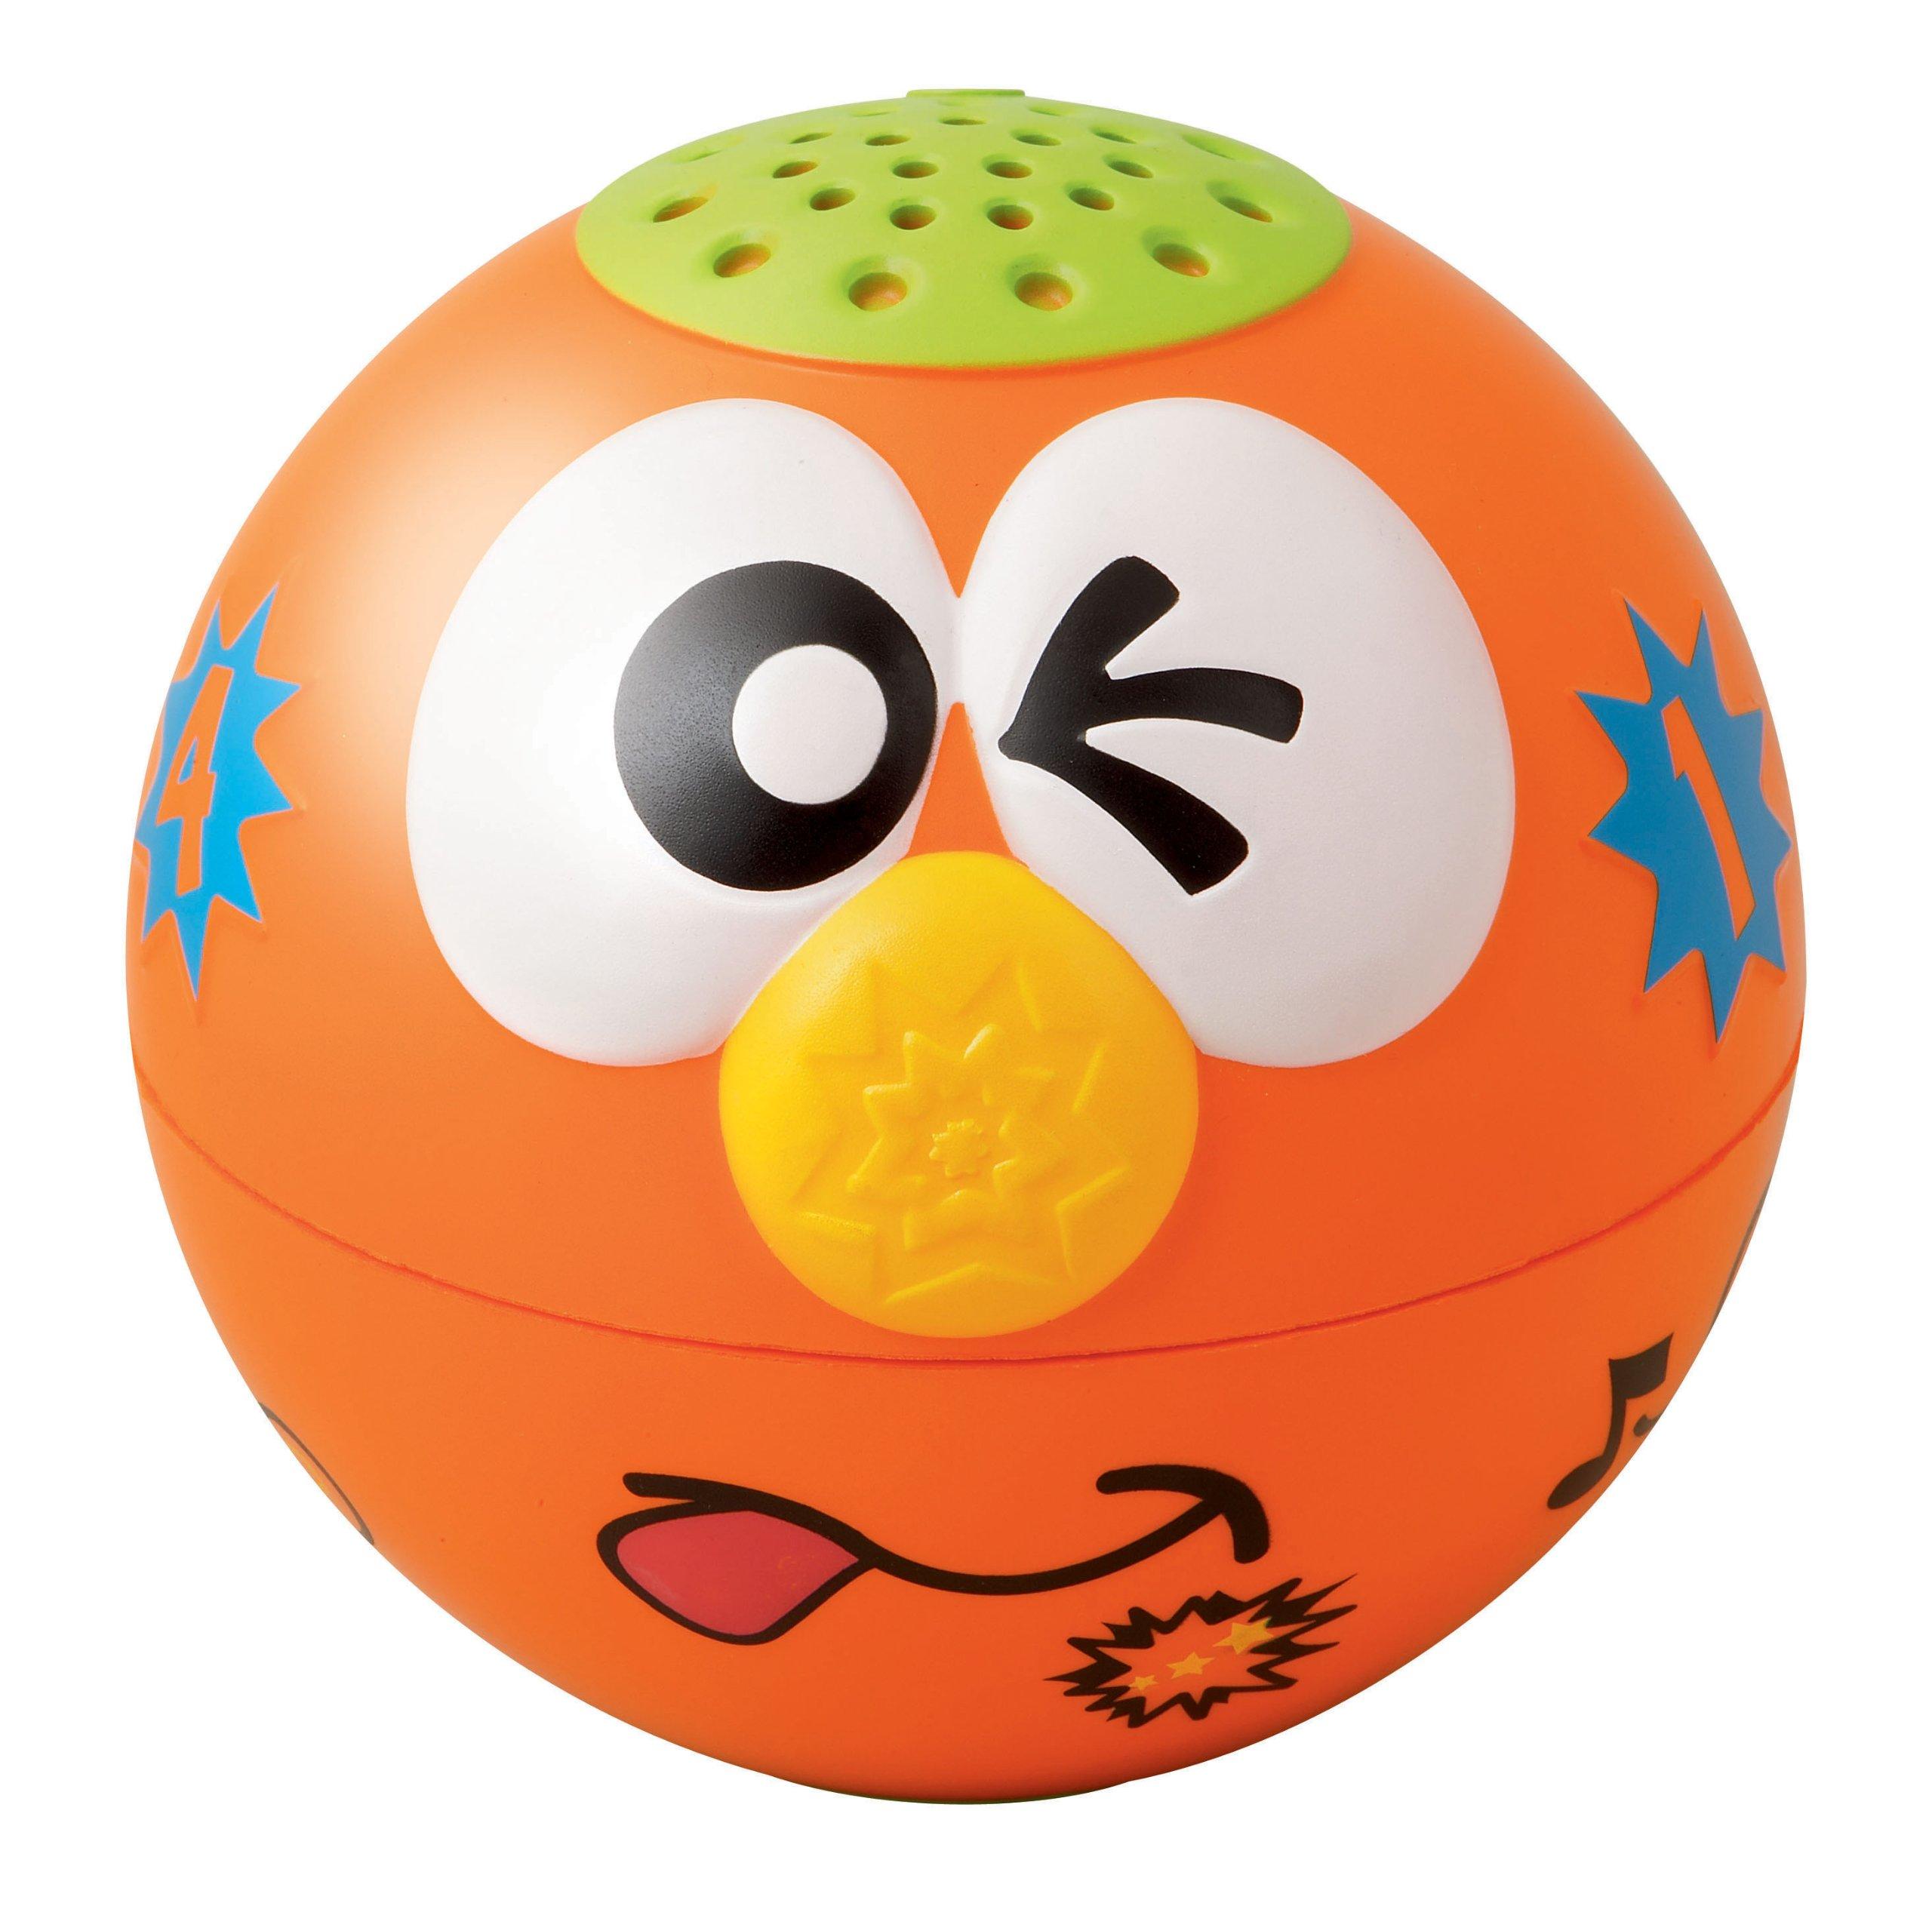 VTech Brilli The Imagination Ball - Orange by VTech (Image #5)